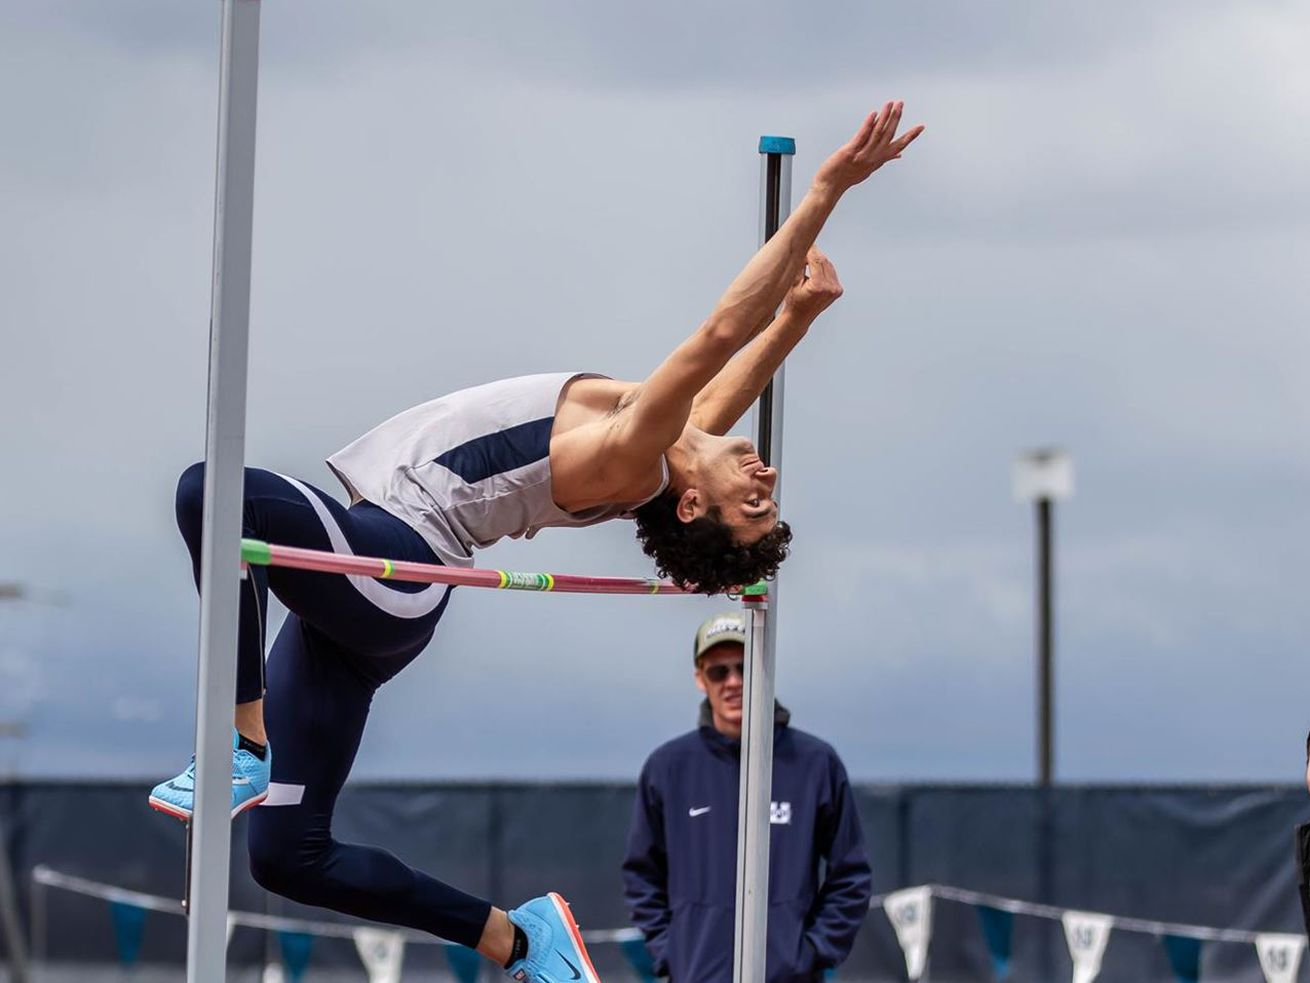 Utah State track athlete Roman Ruiz